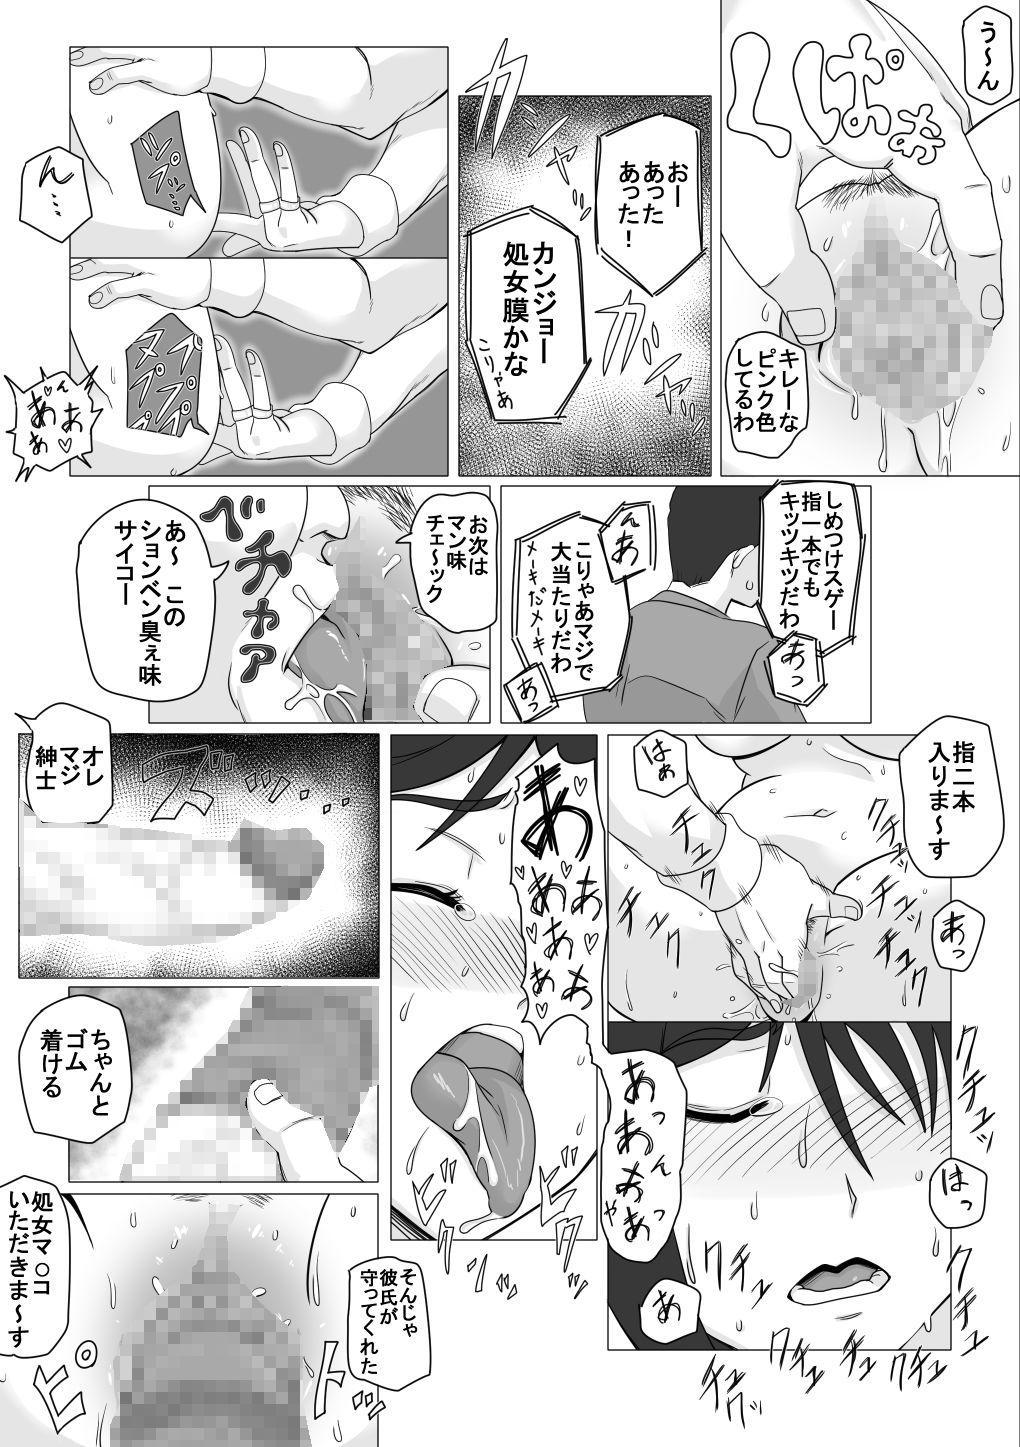 Osananajimi no Natsuyasumi 17